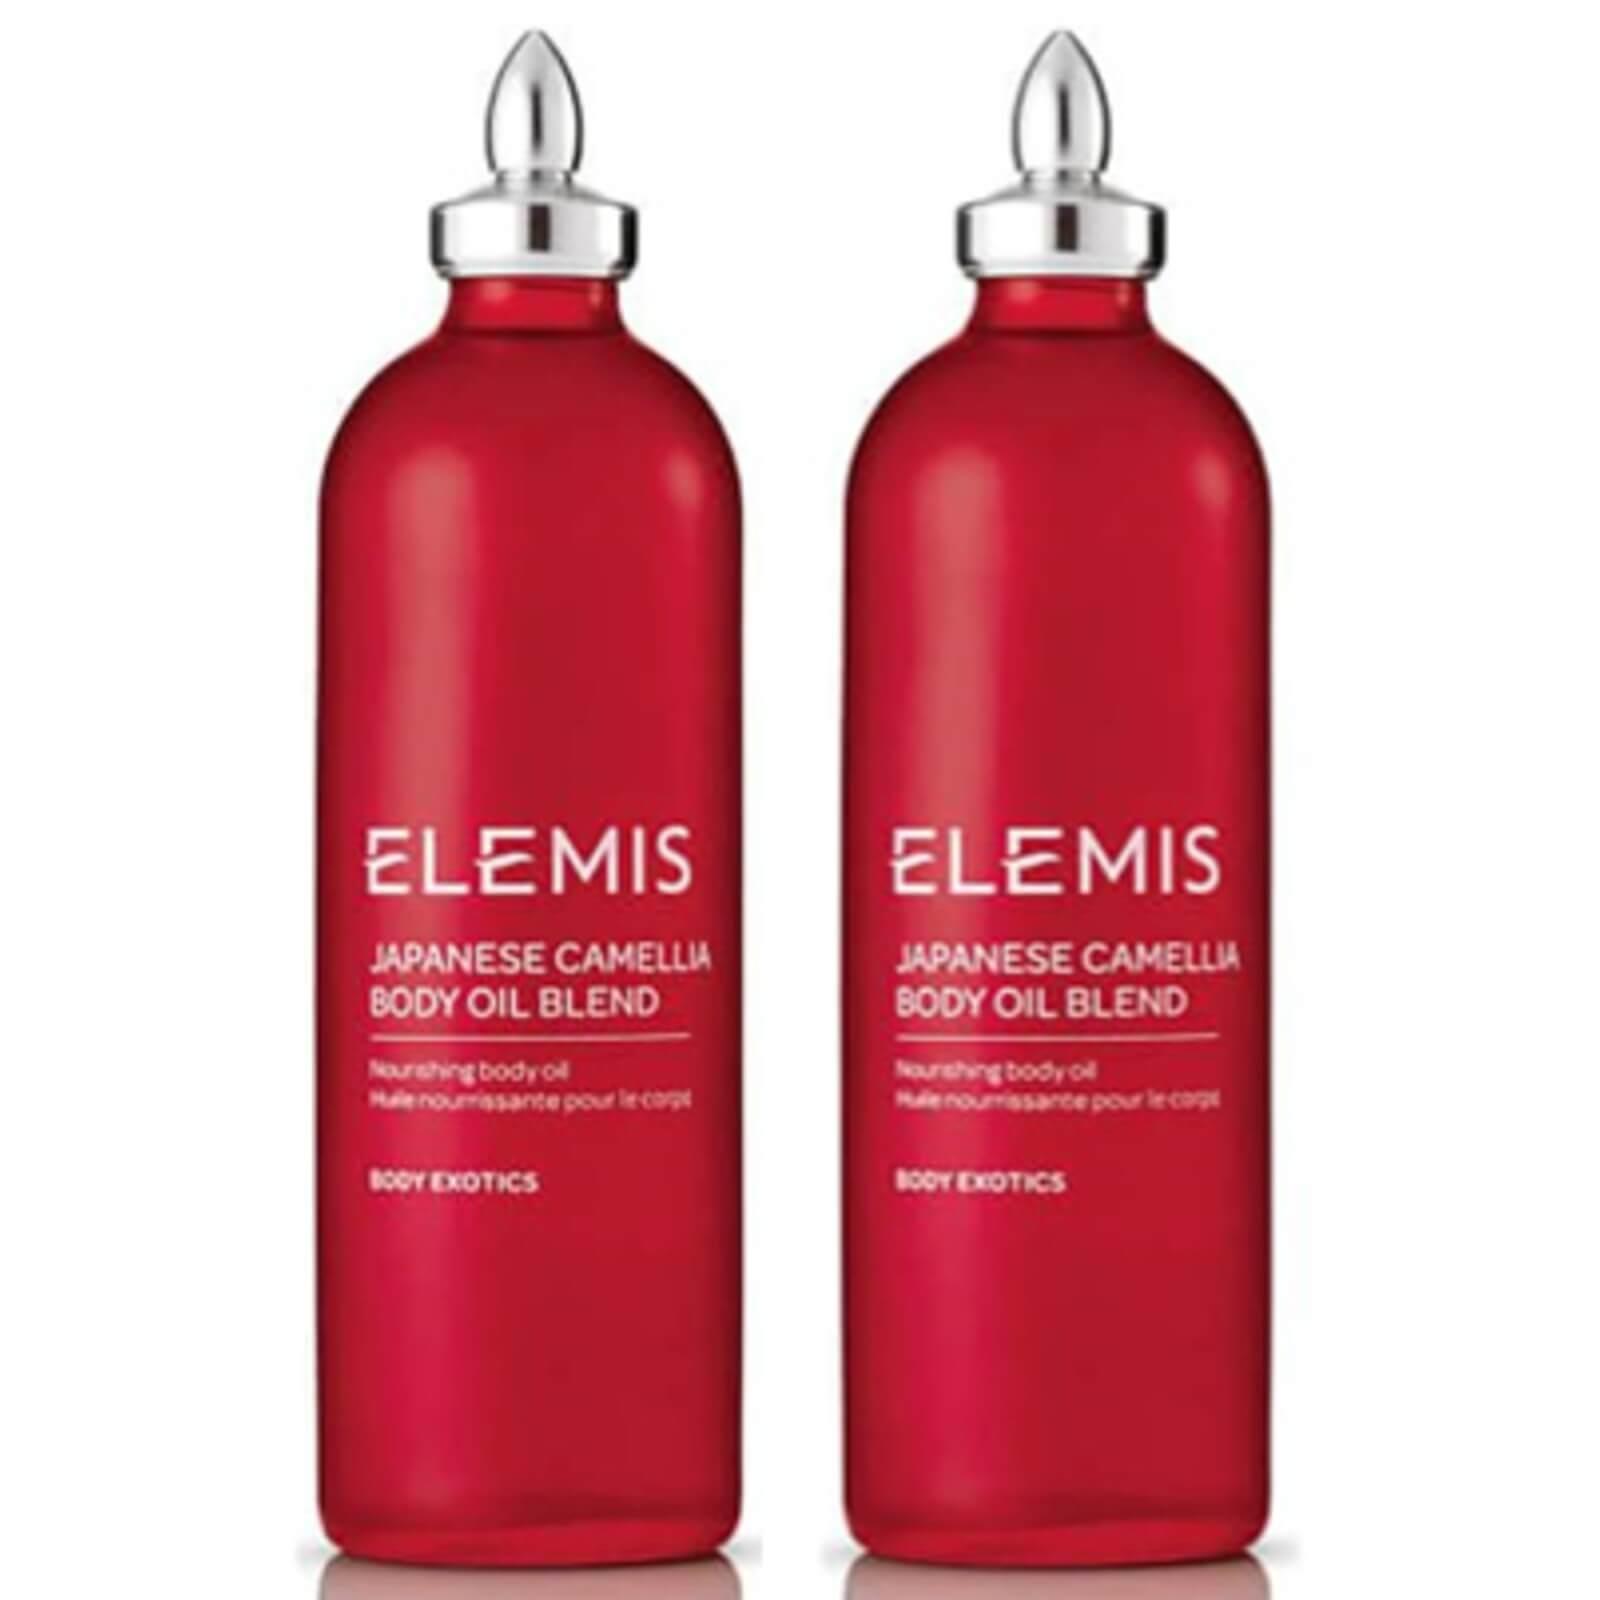 Купить Elemis Japanese Camellia Body Oil Blend 100ml Duo